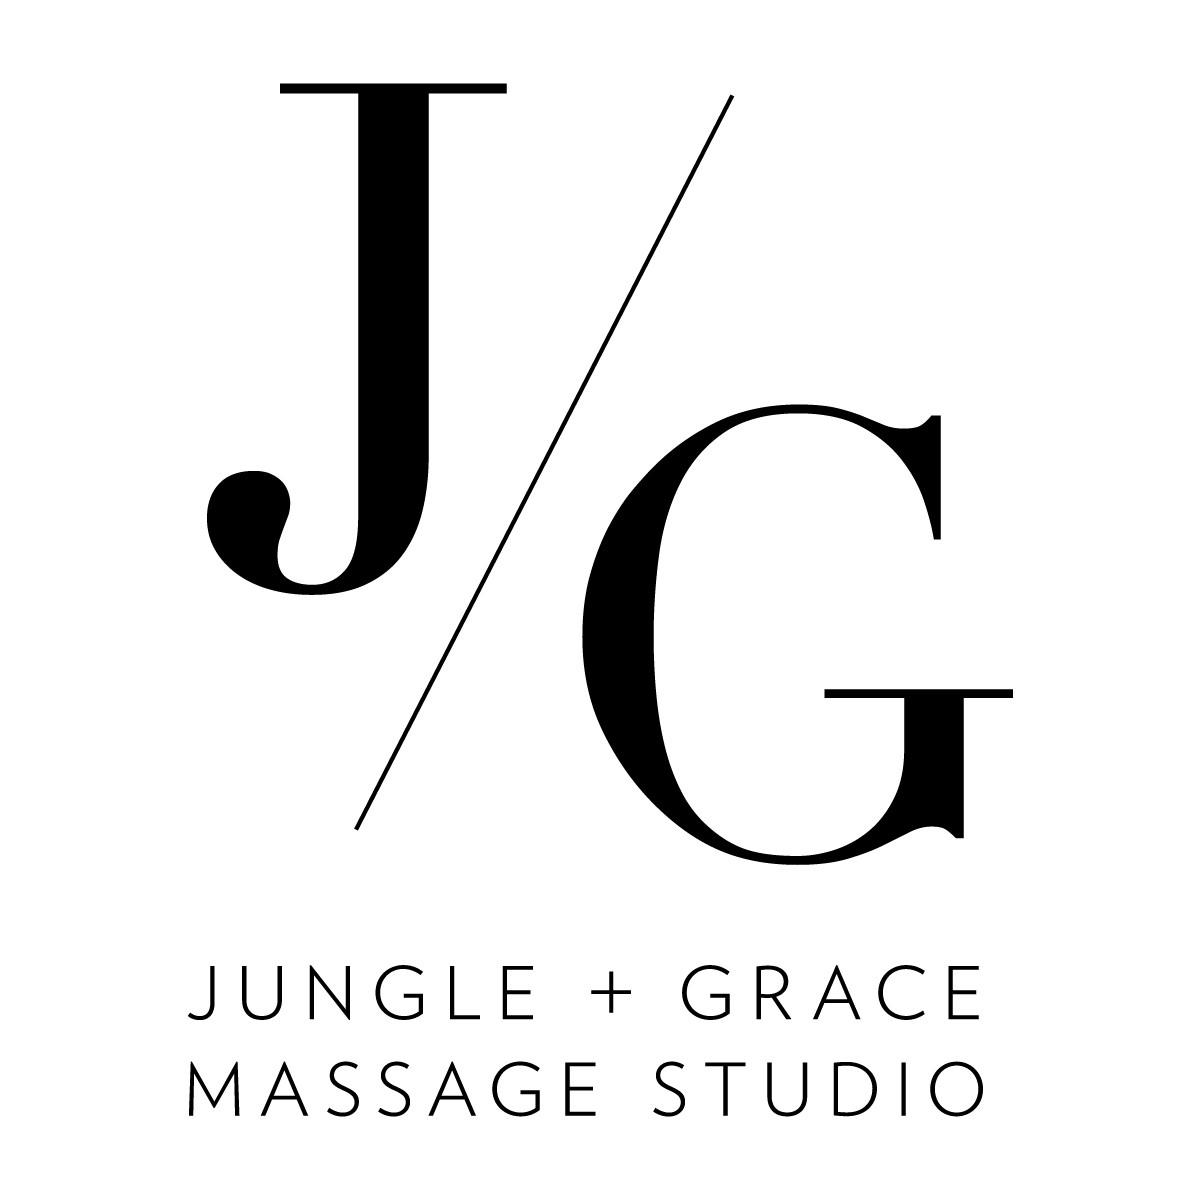 Jungle + Grace Massage Studio